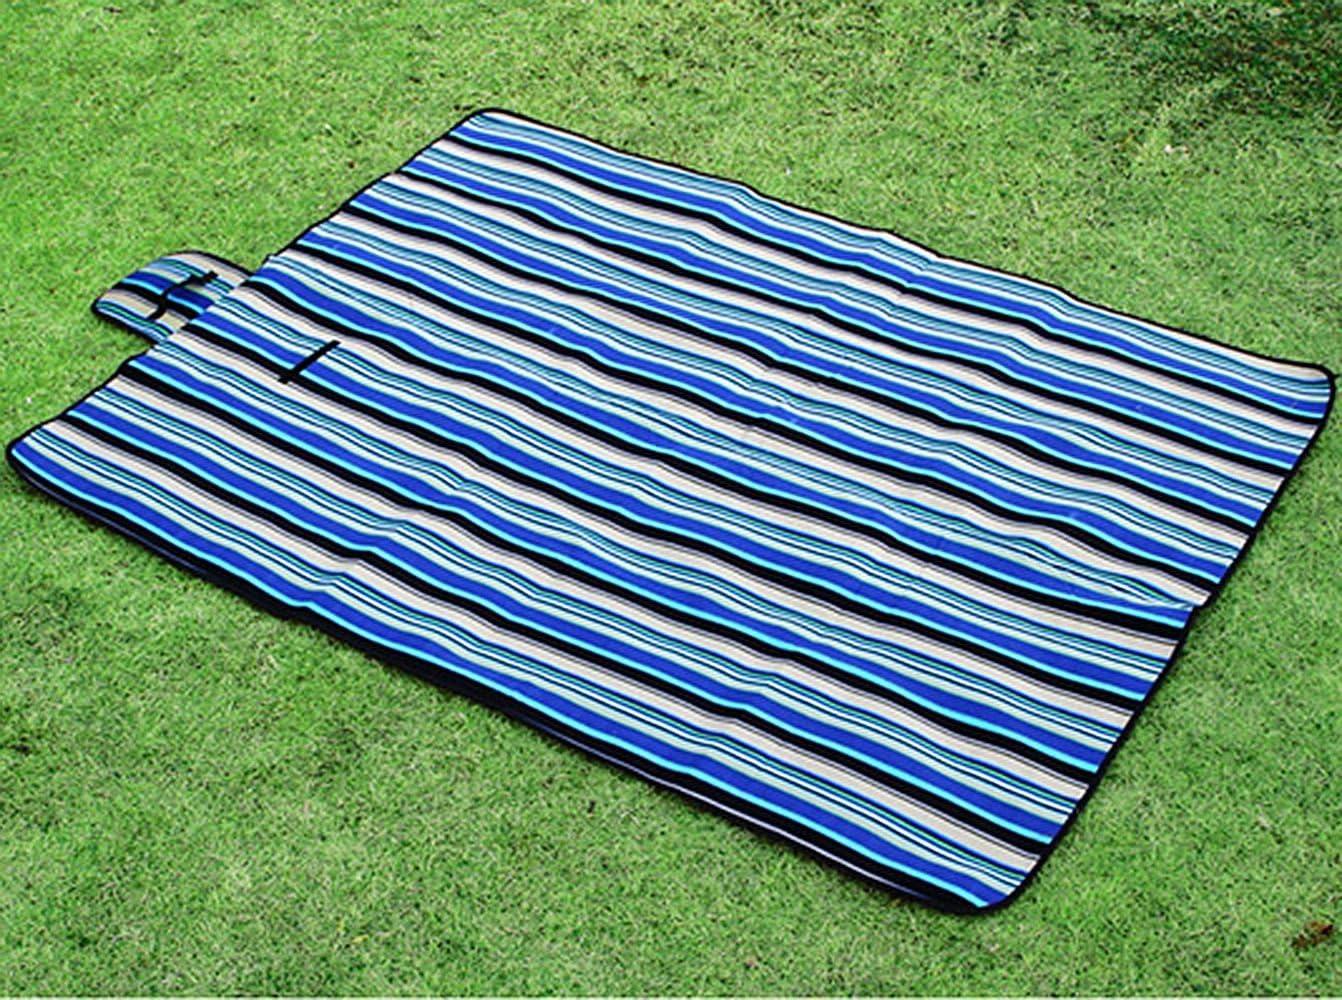 Tappetino Da Picnic Mat Campeggio Tenda Prova D'umidità Impermeabile Spiaggia Mat Rosa Blu Comfort Picnic Mat 150Cm * 200Cm * 0,25 Centimetri Stuoia Pieghevole Blue